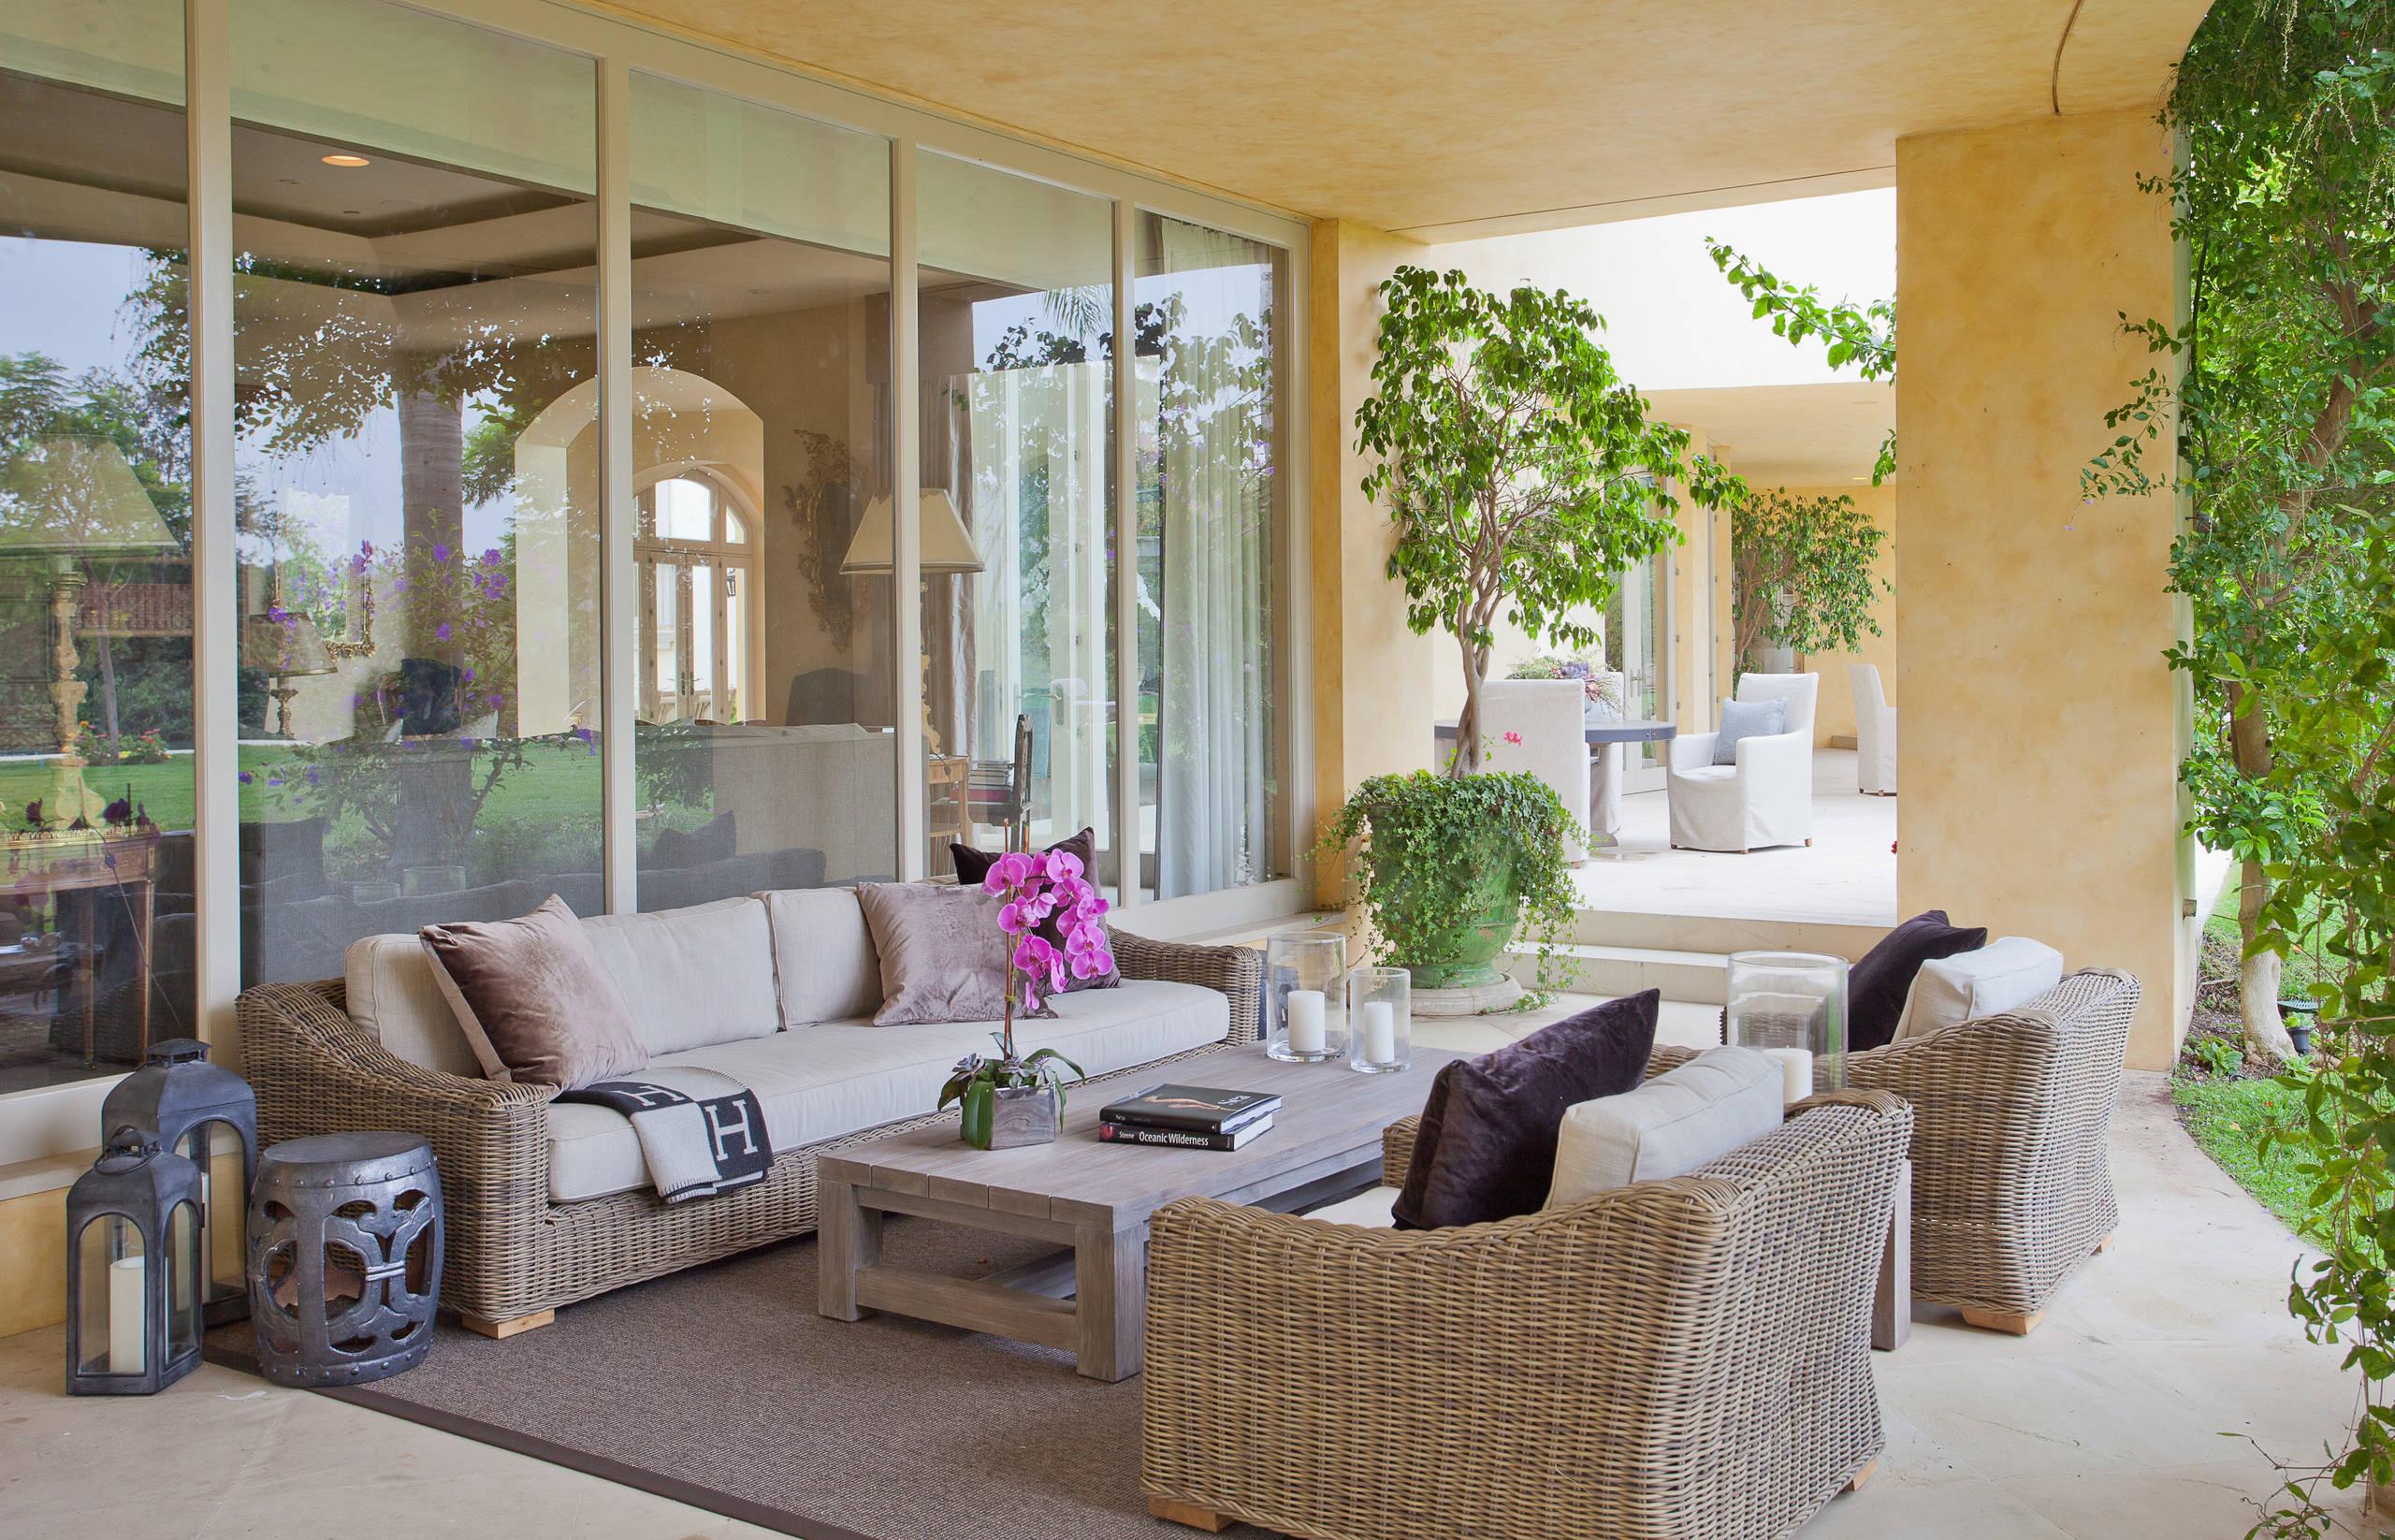 Beautiful Patio Beautiful Mediterranean Patio Designs That Will Replenish Your Energy